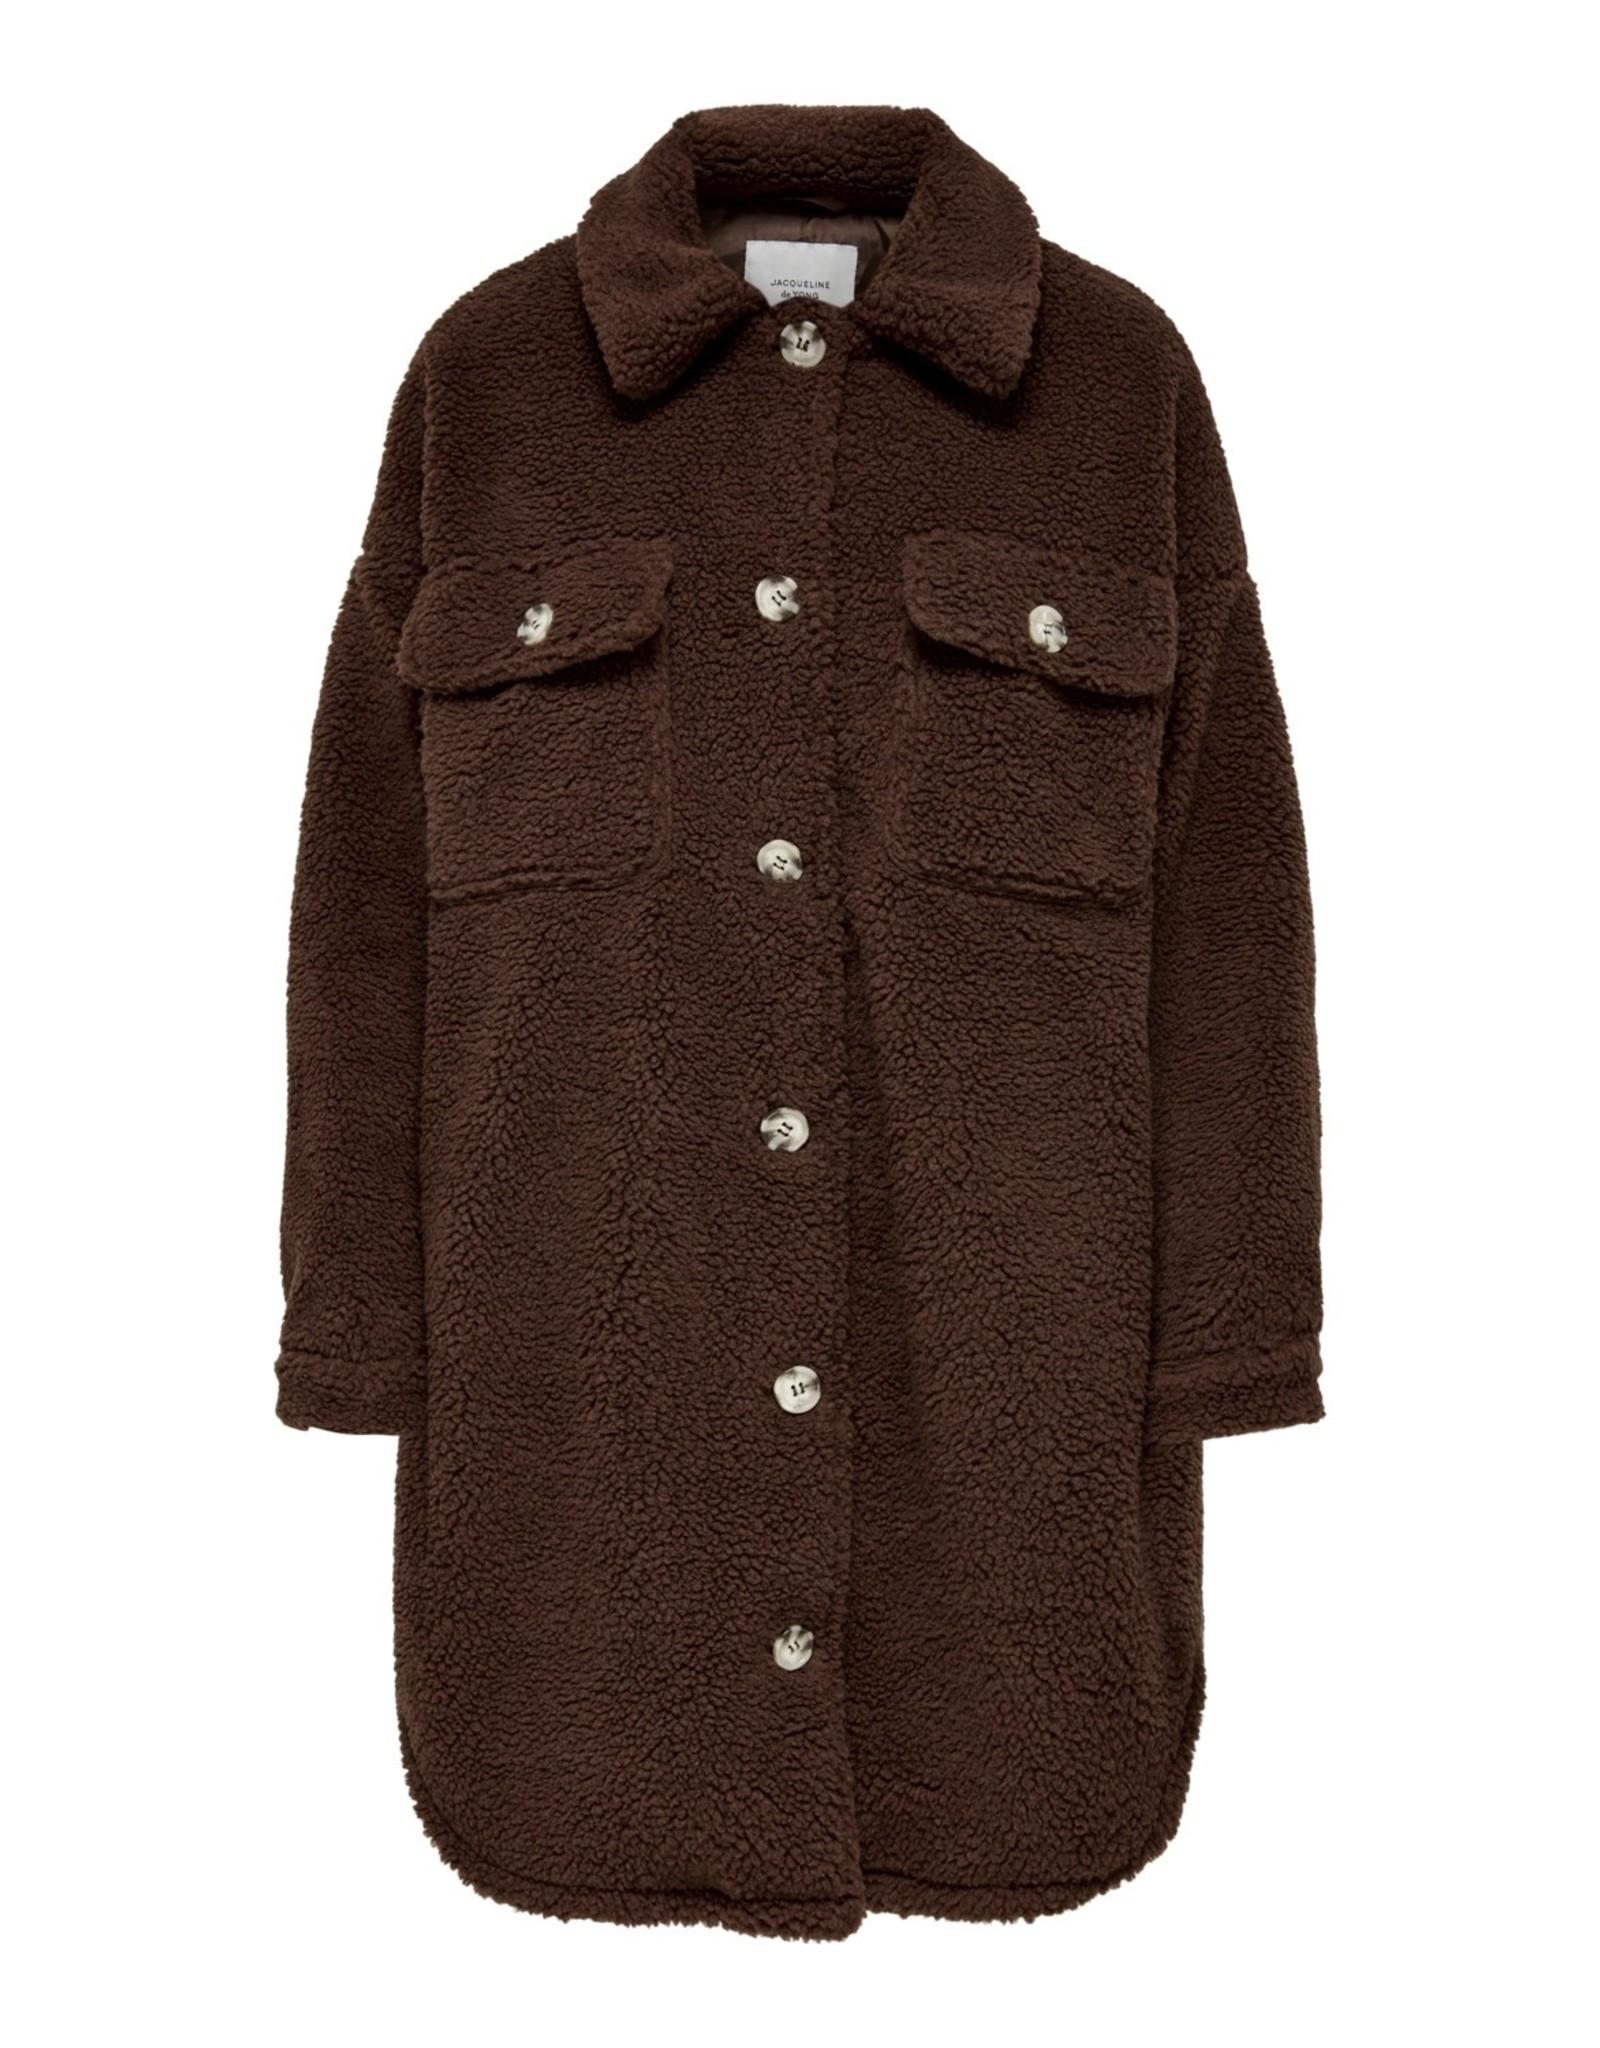 TEDDY COAT BROWN